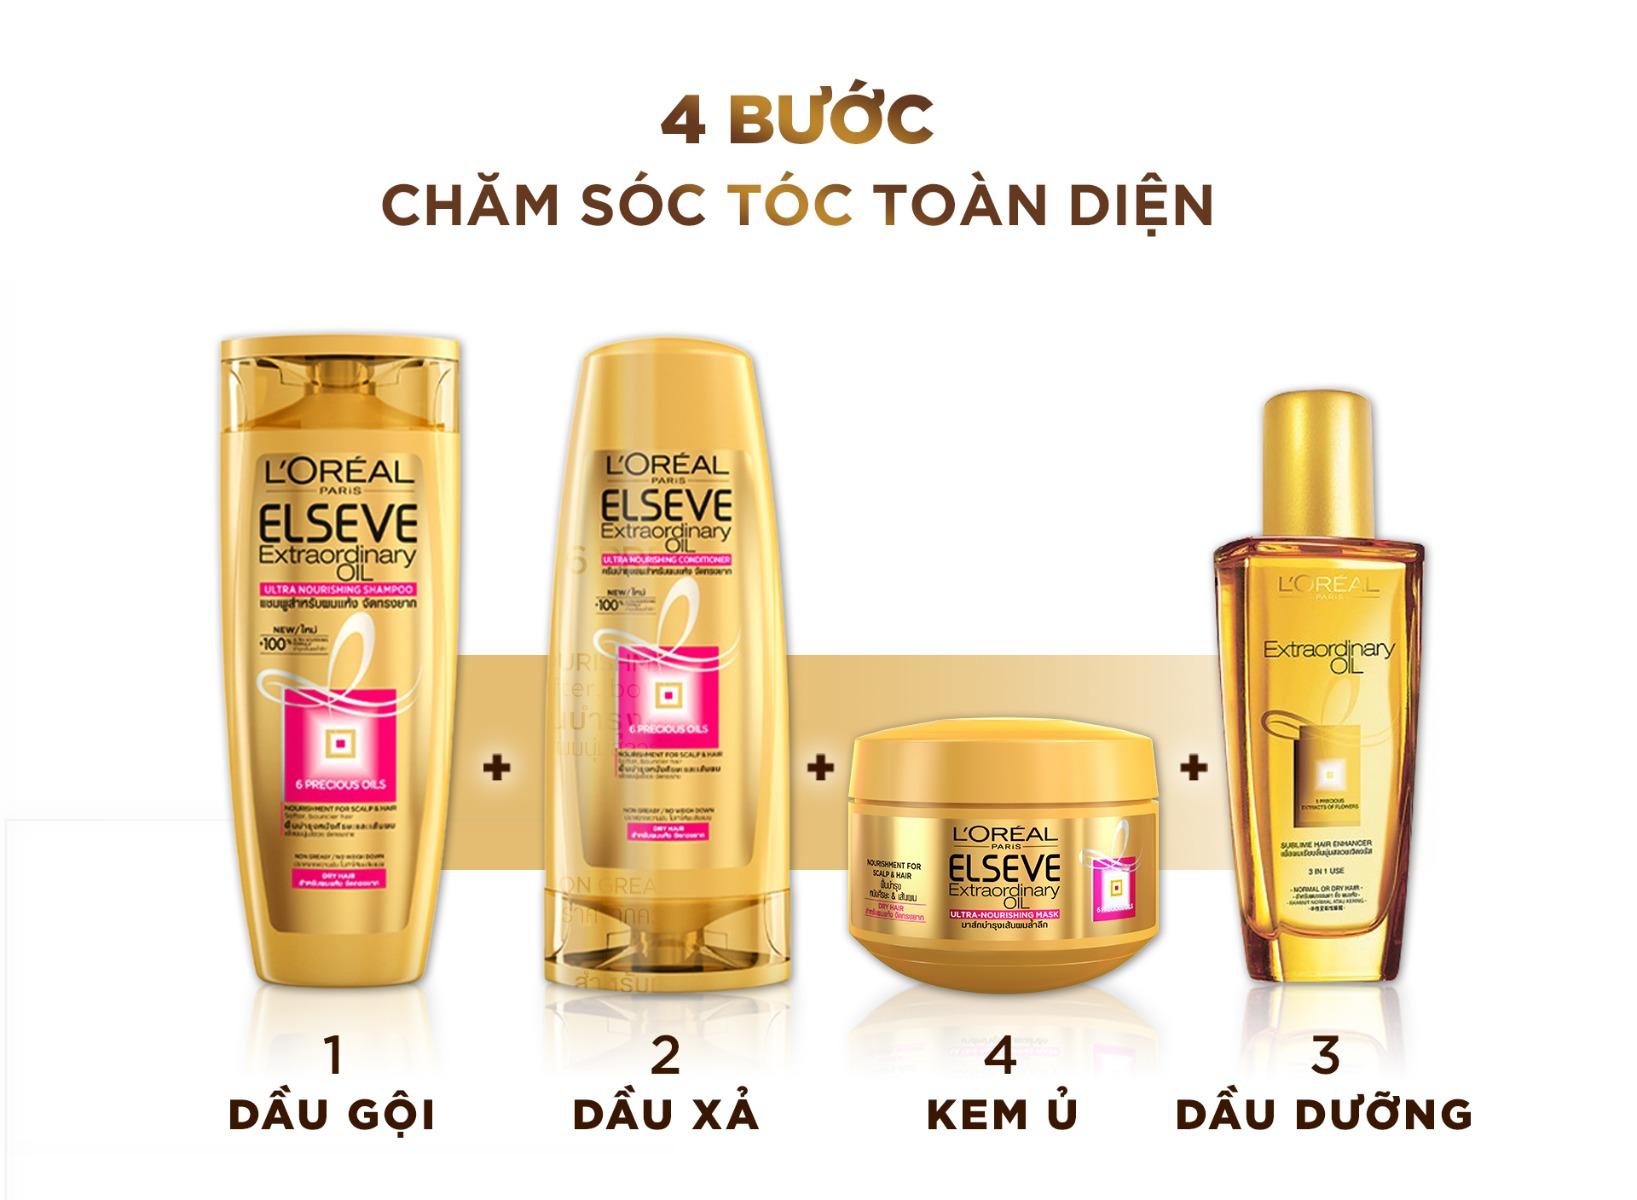 https://media.hasaki.vn/wysiwyg/quynhtrang/Trang/kem-u-toc-cho-toc-kho-l-oreal-200ml.jpeg